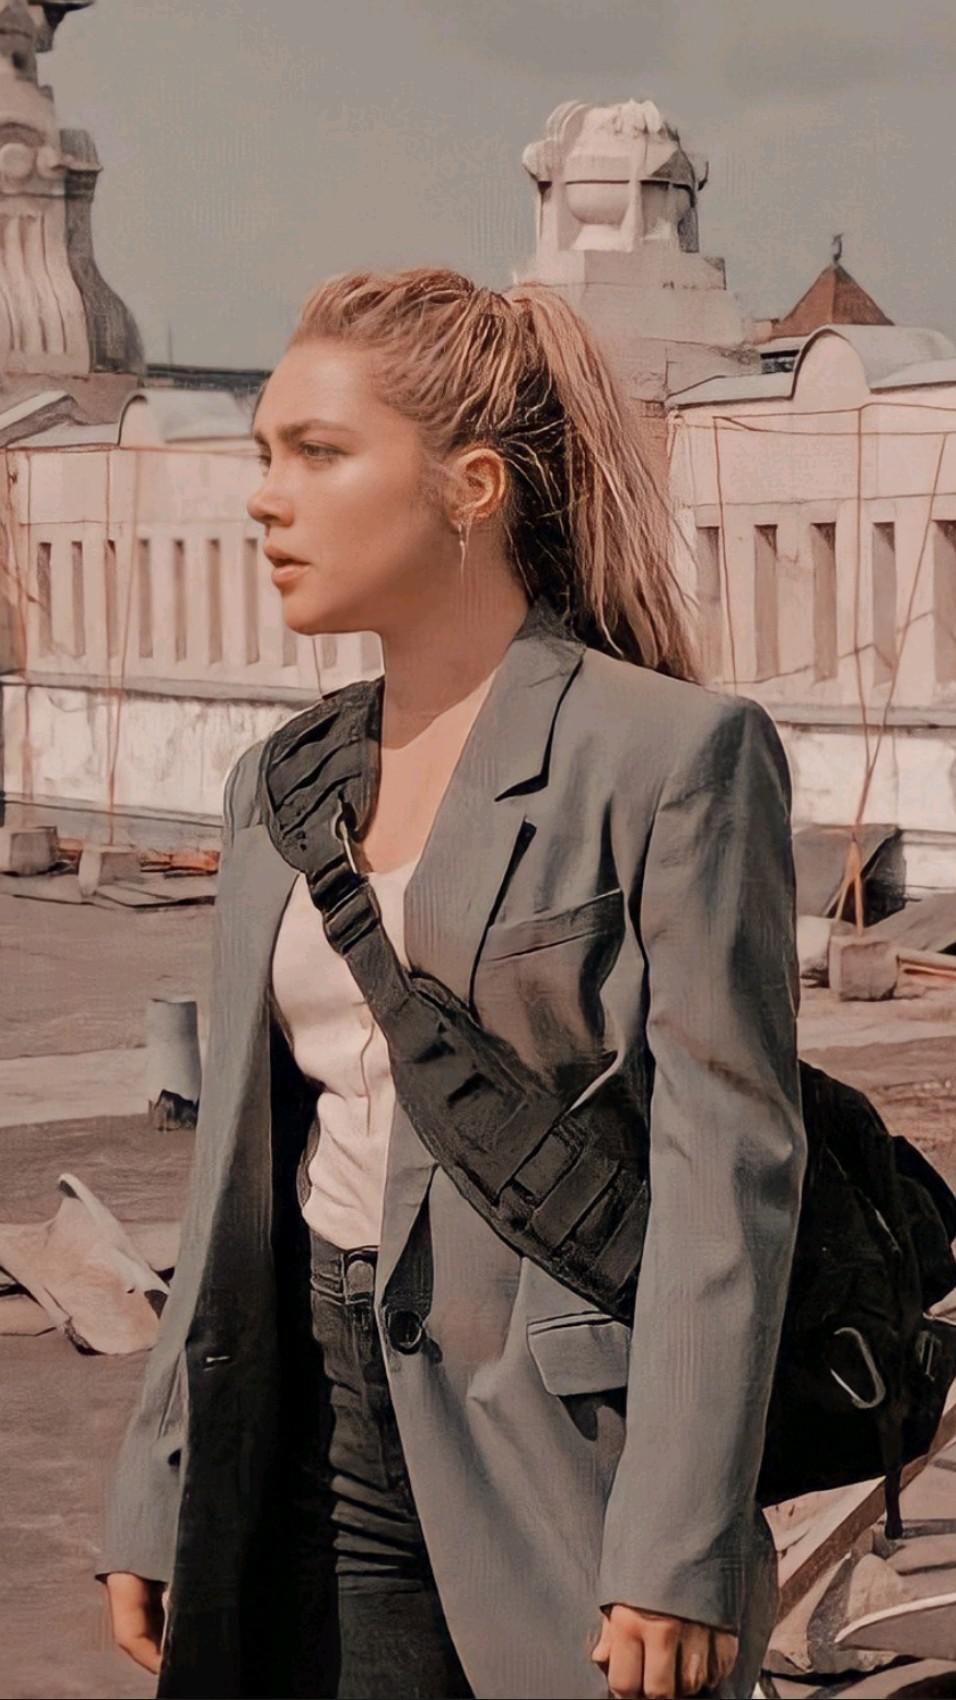 Yelena Belova